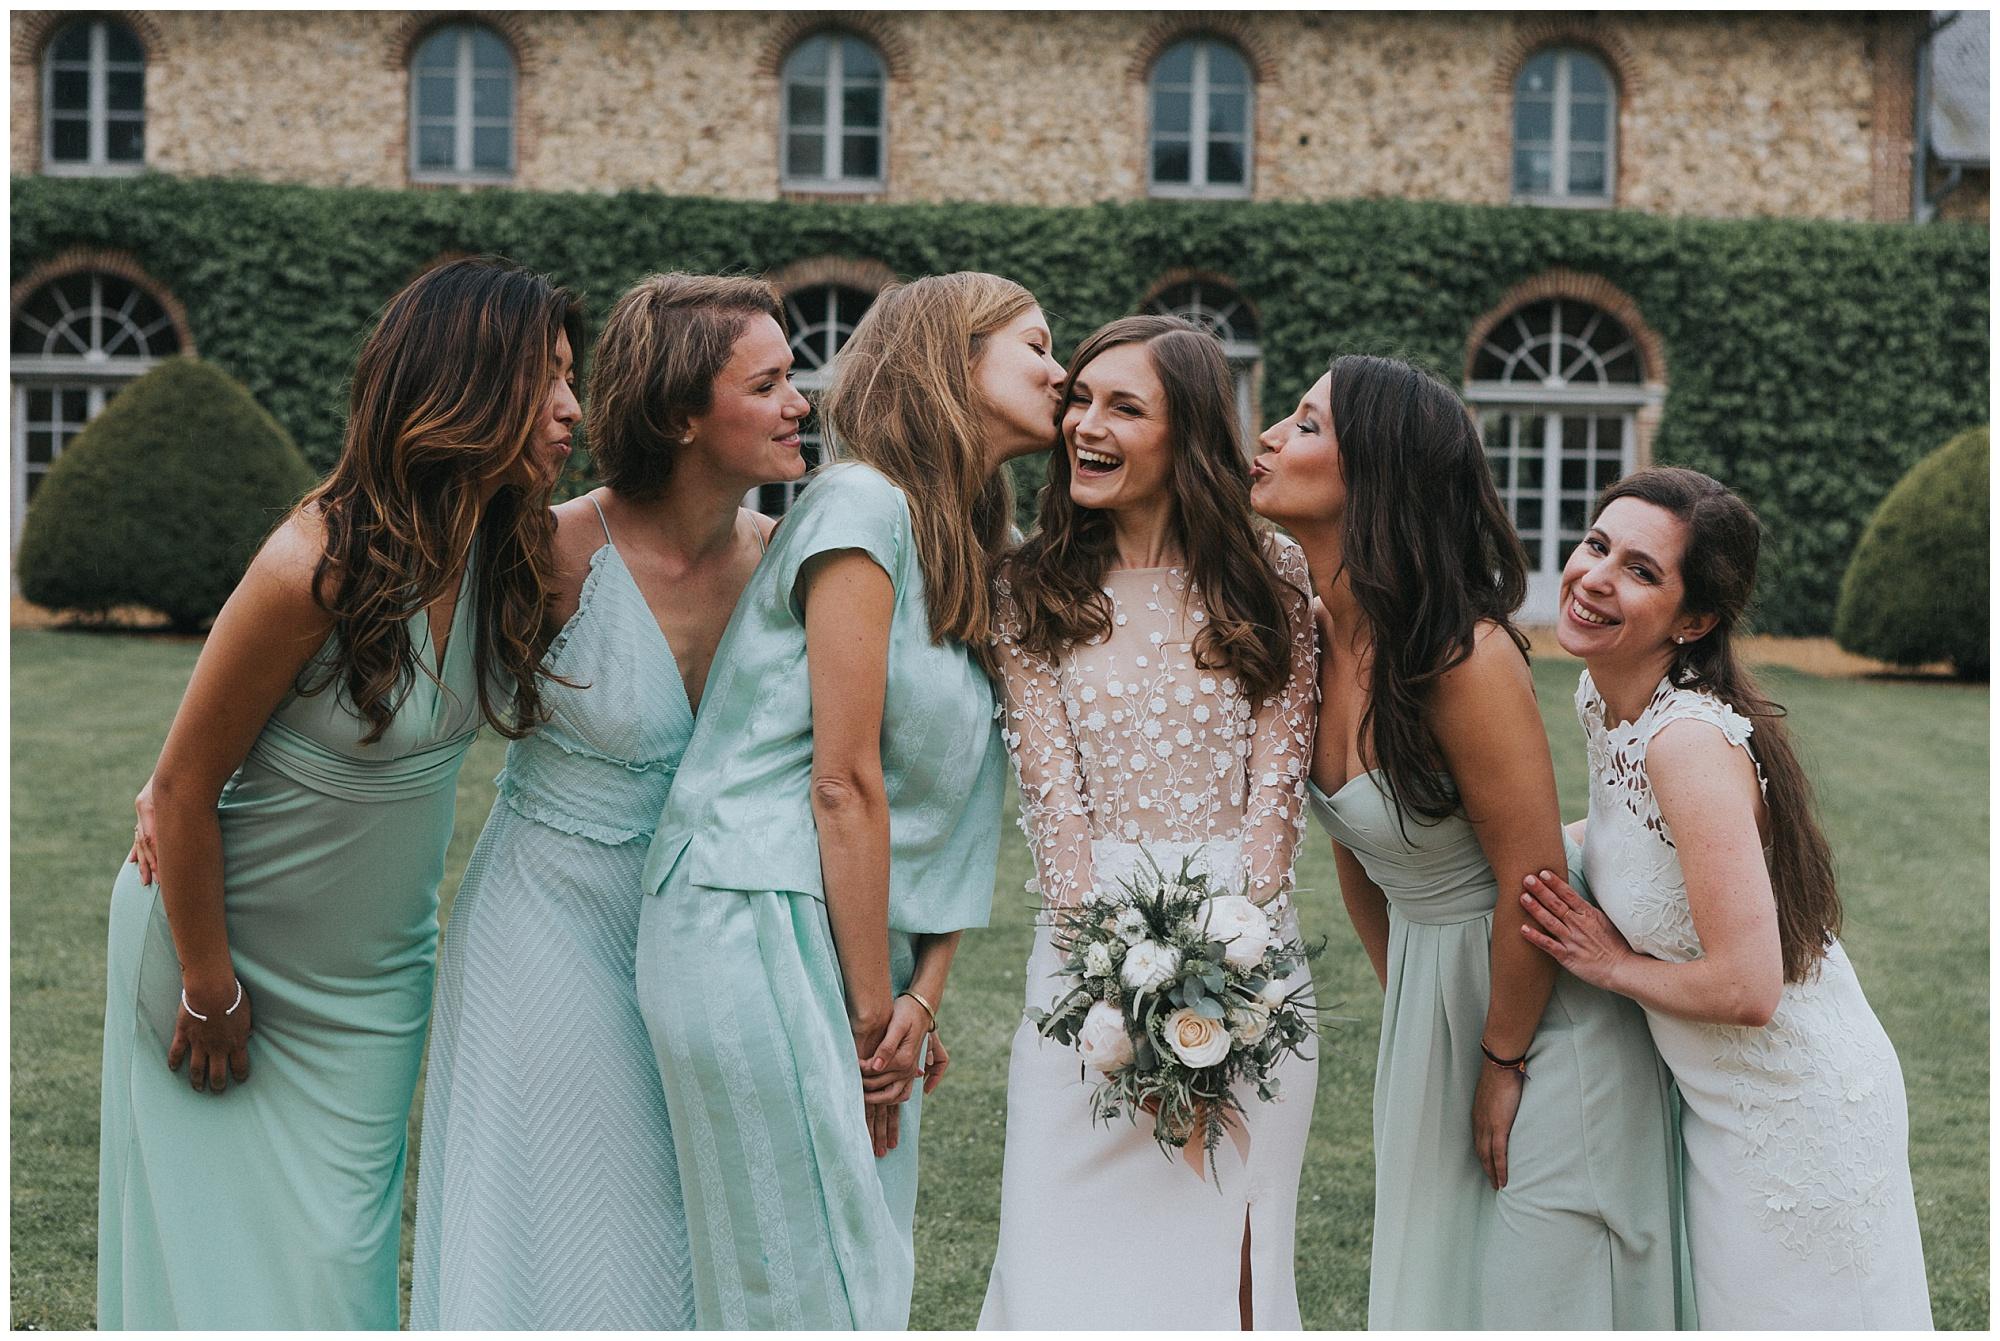 Kateryna-photos-photographer-reims-domaine-des-evis-mariage-normandie-rime-arodaky_0261.jpg